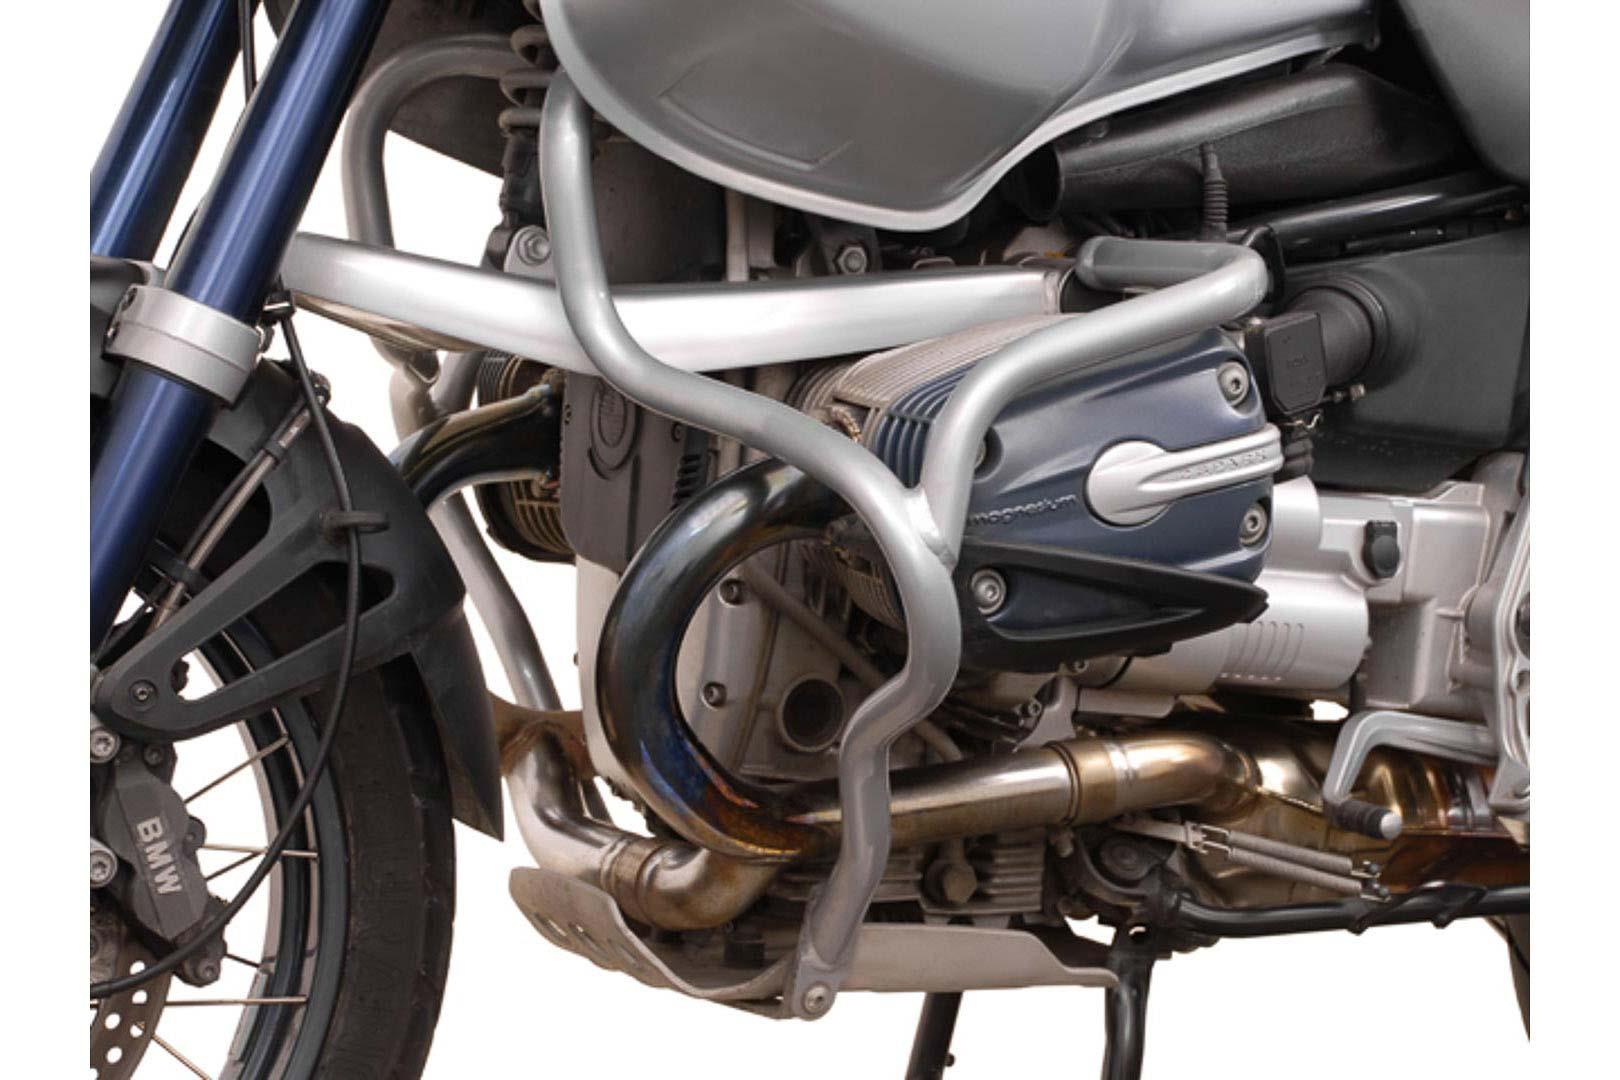 SW-Motech Moottorinsuojarauta BMW R1150GS Adventure hopea